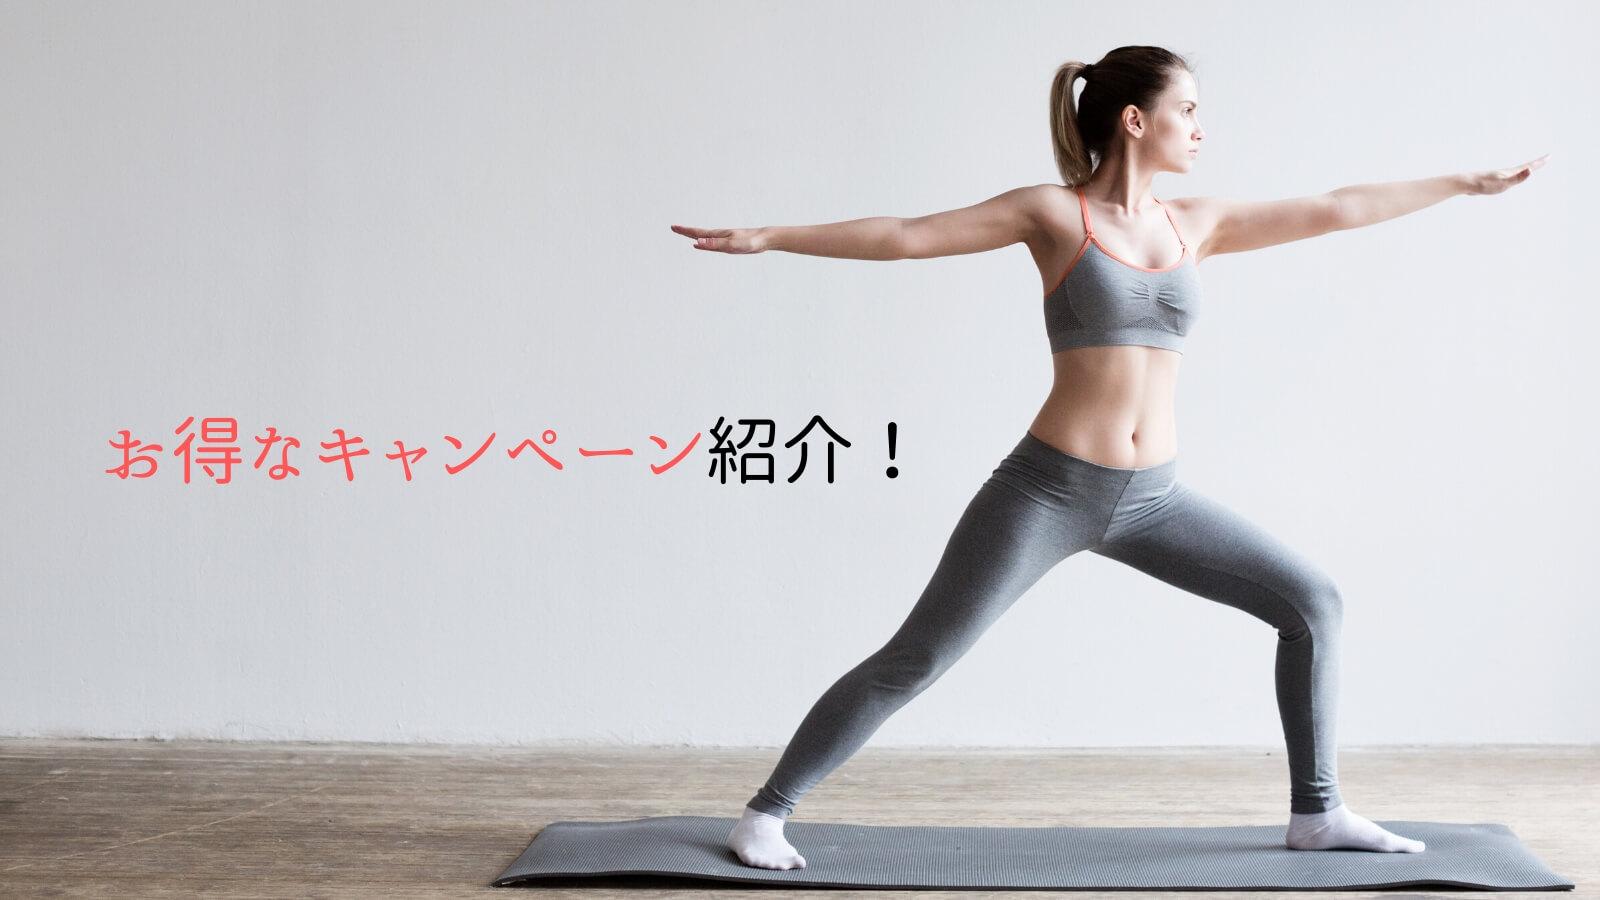 zen place pilates by BASI Pilatesで開催中のお得なキャンペーン